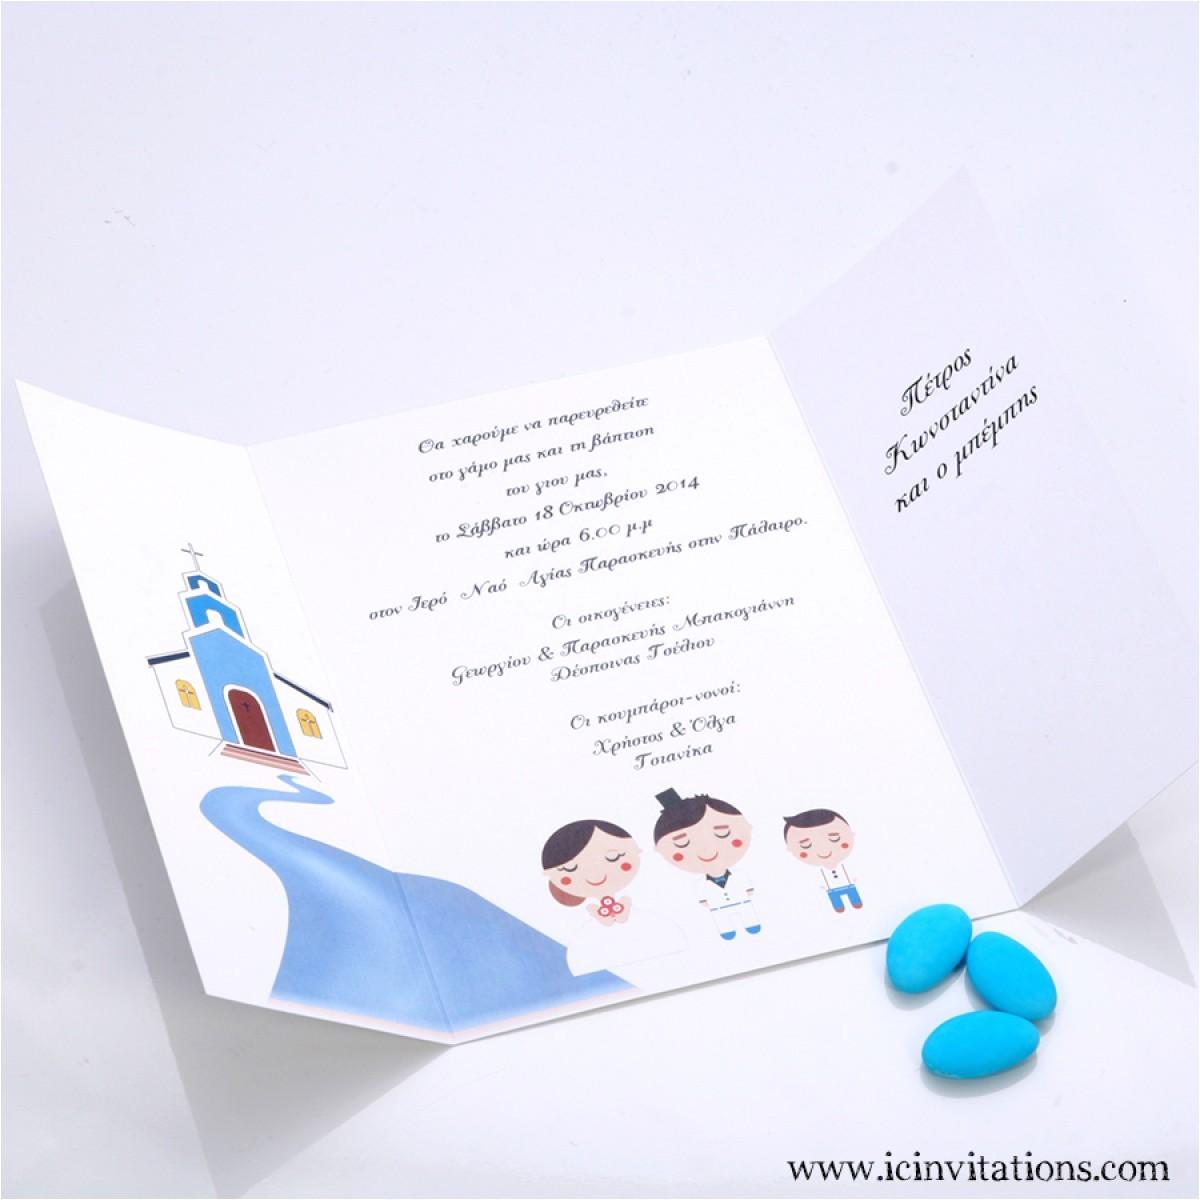 Wedding and Baptism together Invitations Wedding and Baptism to Her Invitations Cloudinvitation